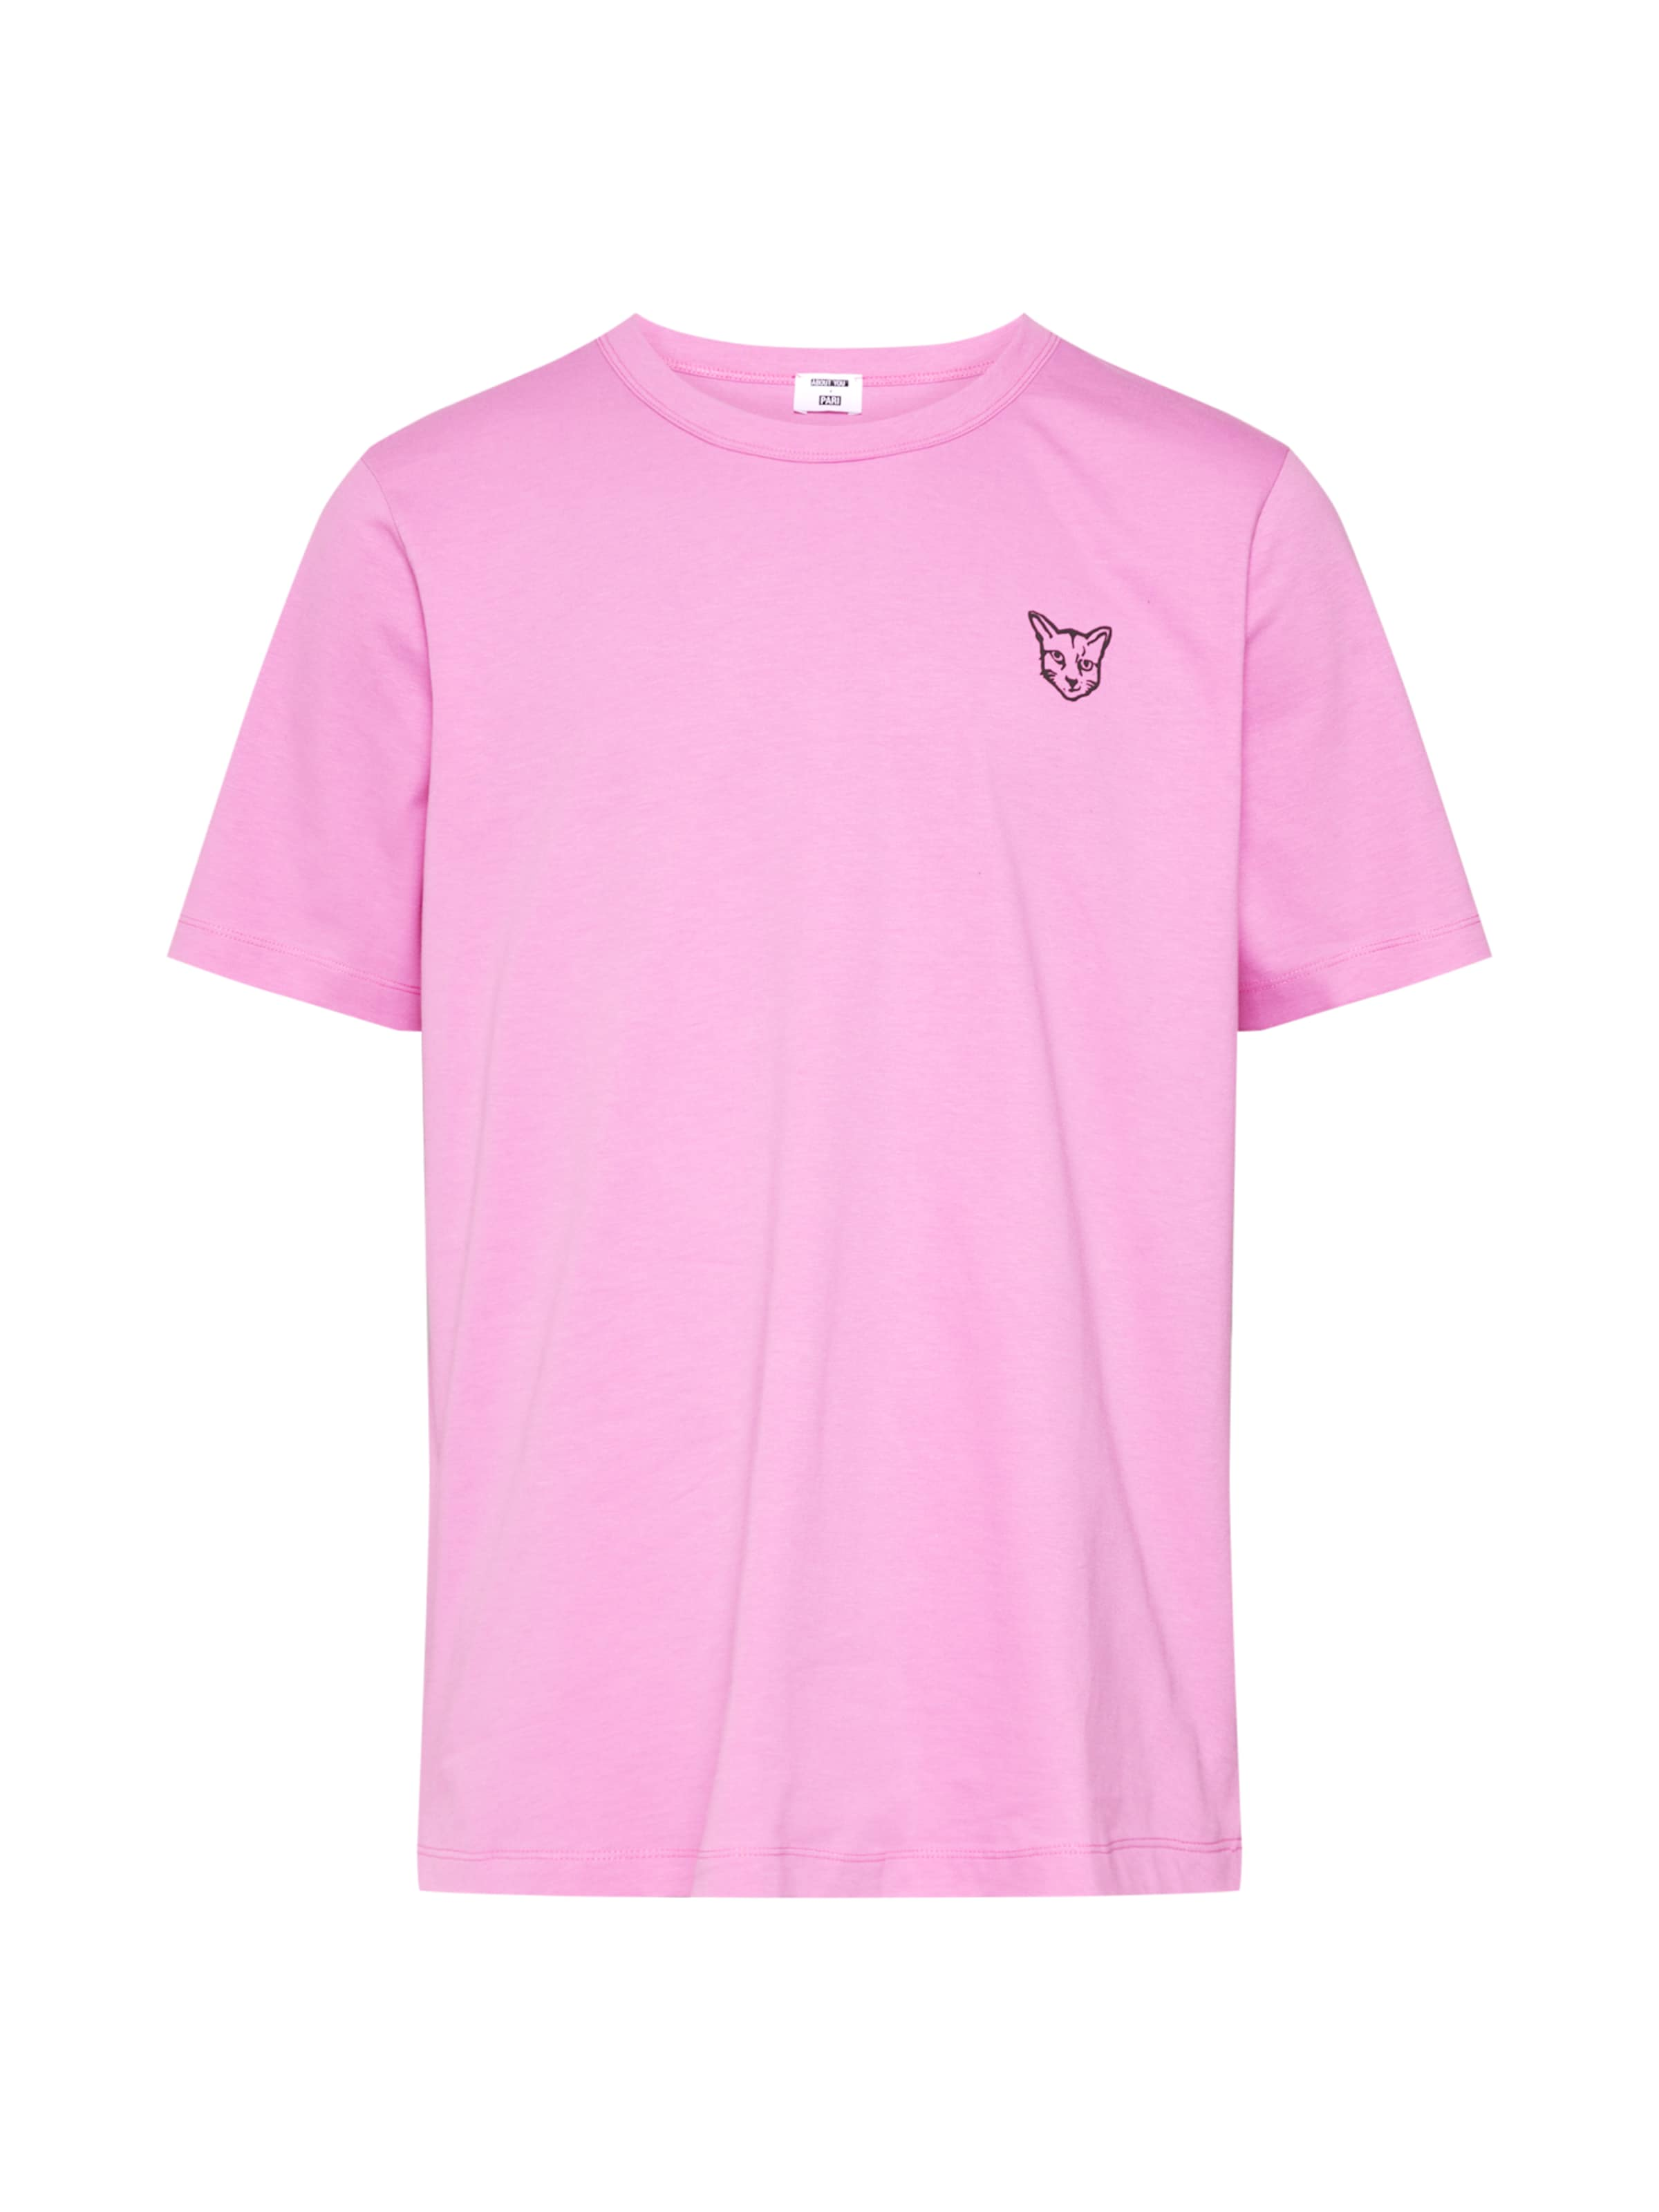 About You T PinkSchwarz In 'jim' Pari X shirt gyYf6bv7